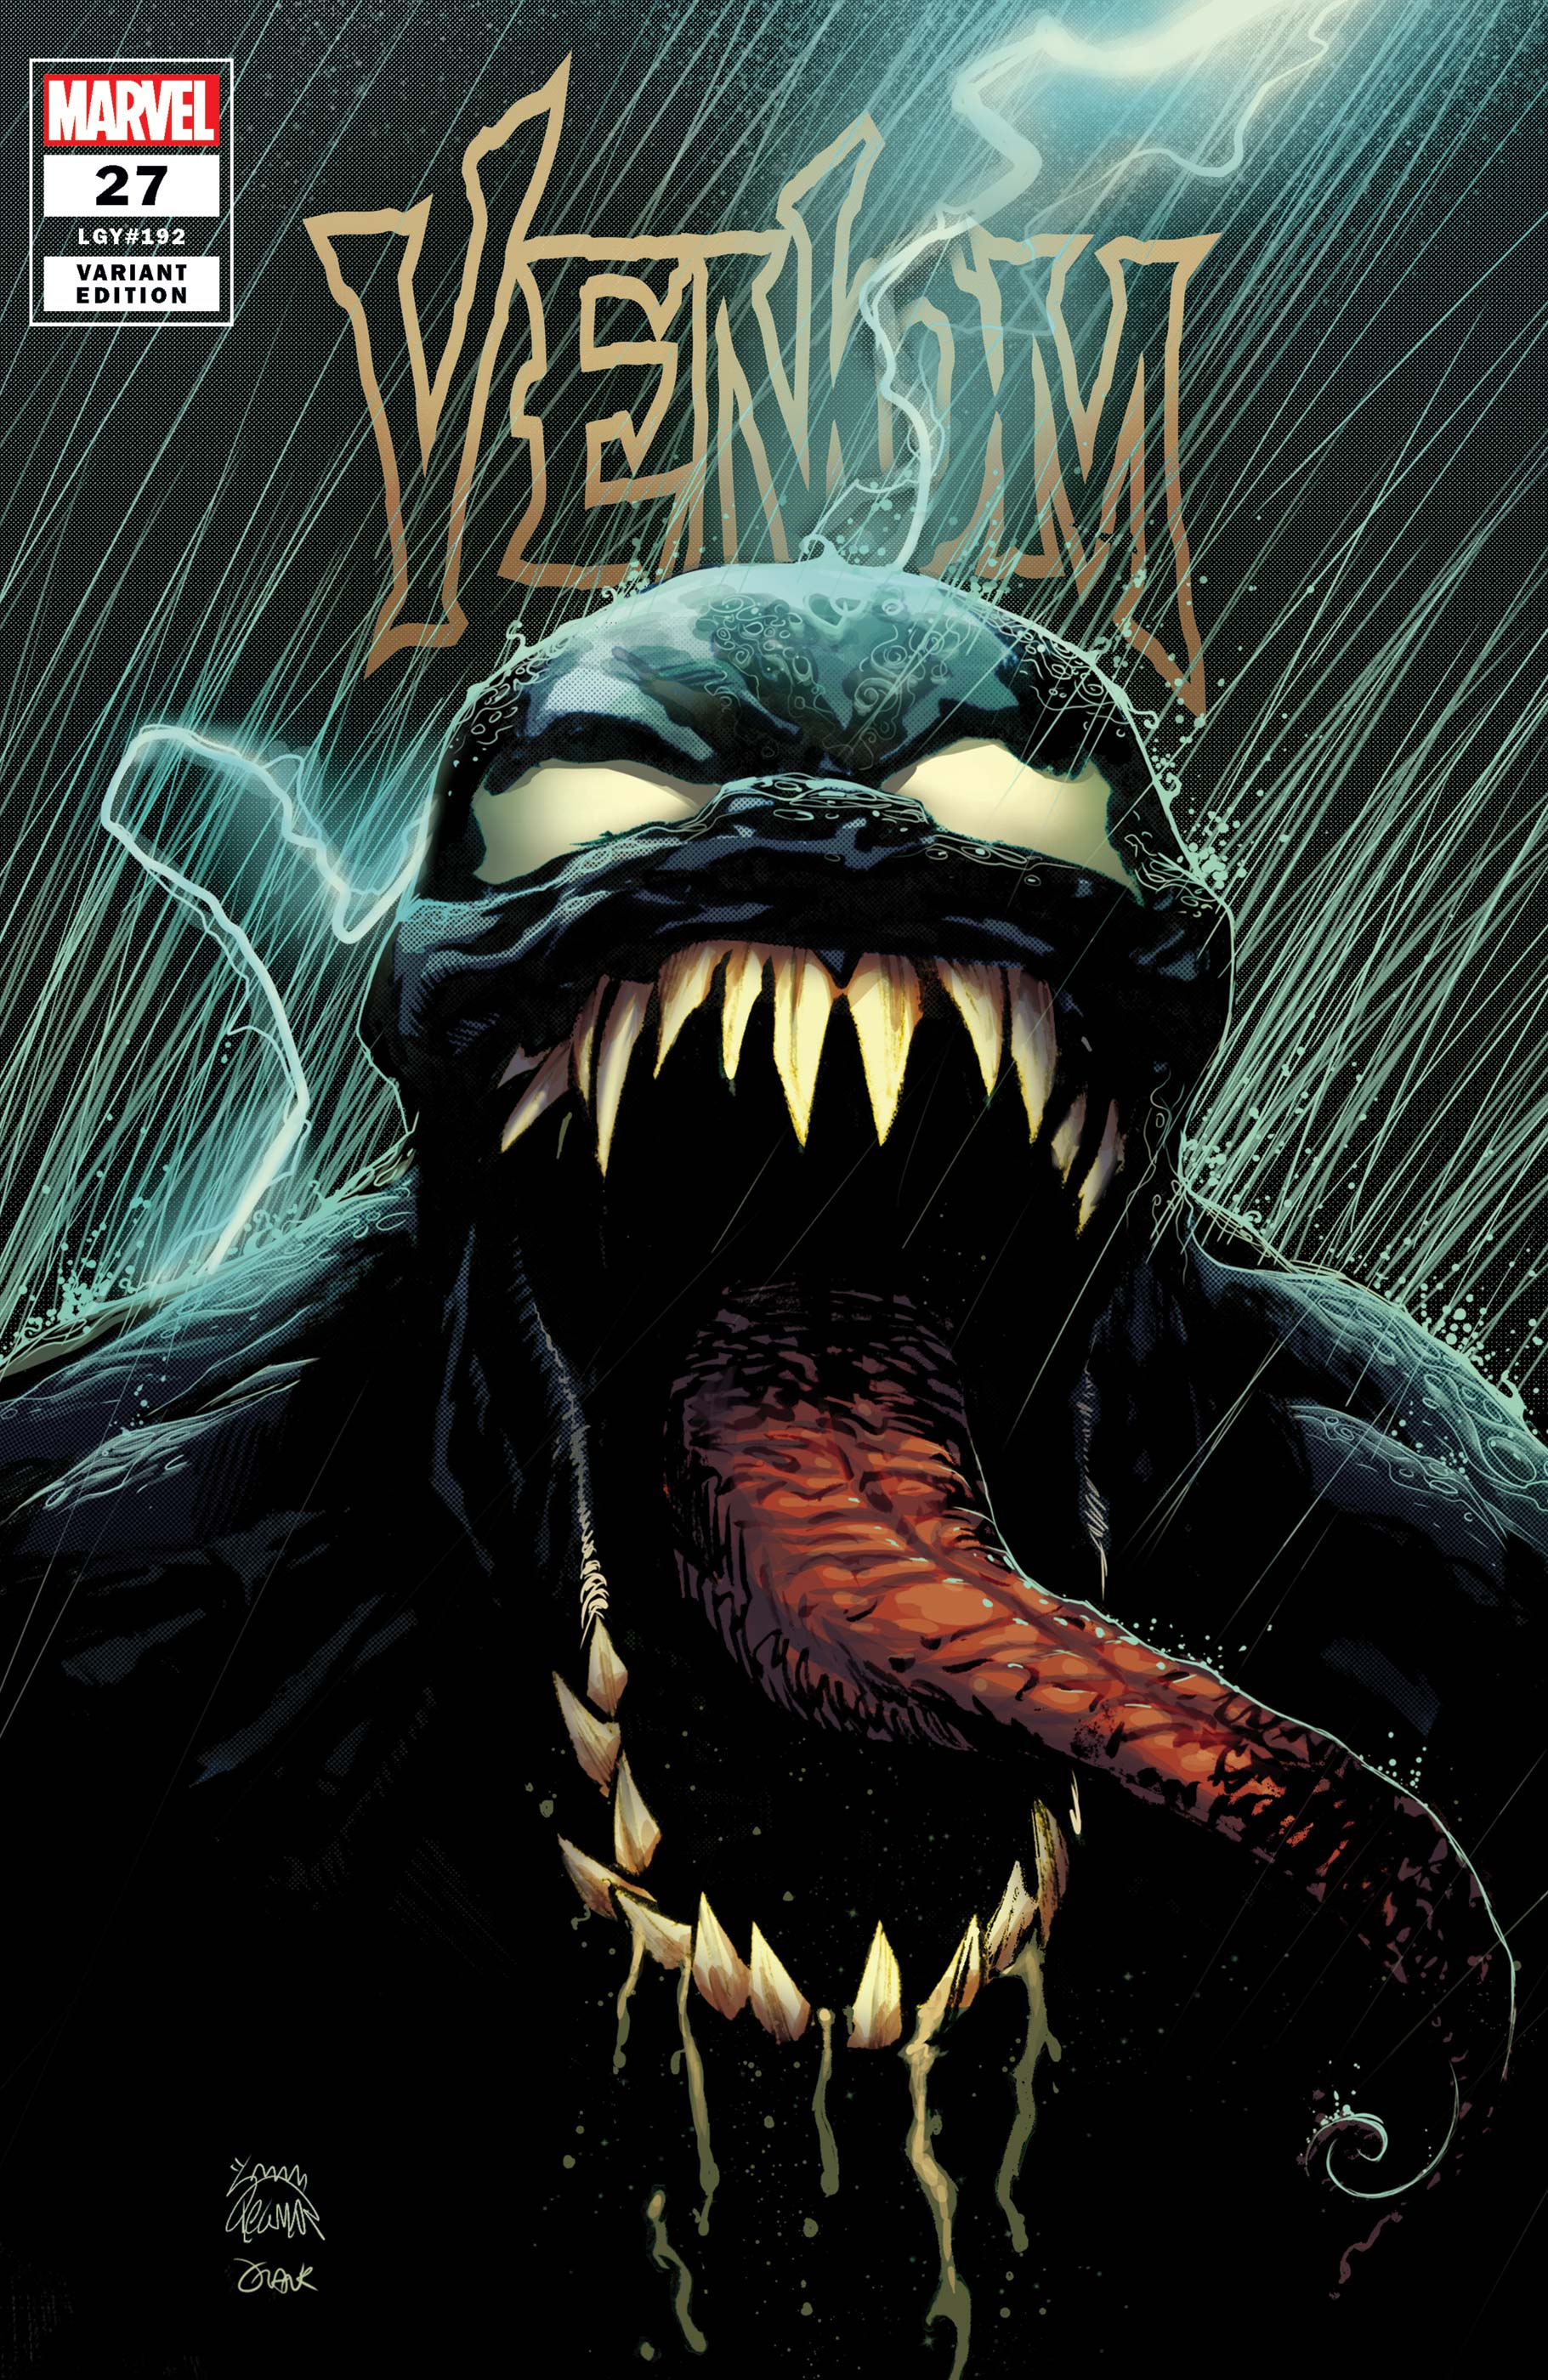 Venom (2018) #27 (Variant)